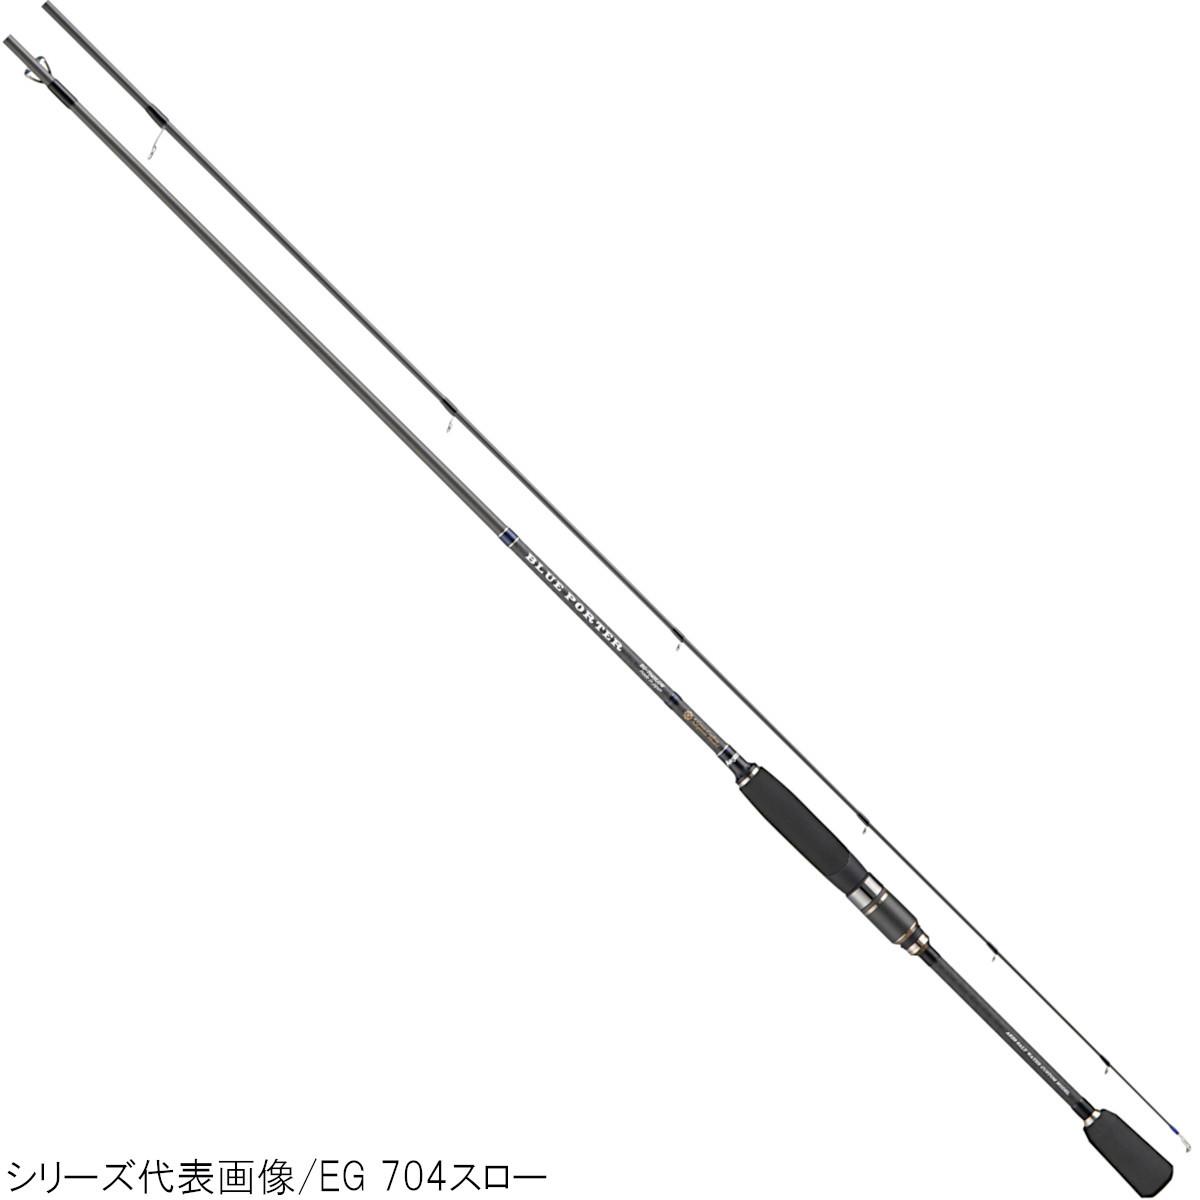 ARES ブルーポーター EG 806L(エギングロッド) 宇崎日新【同梱不可】